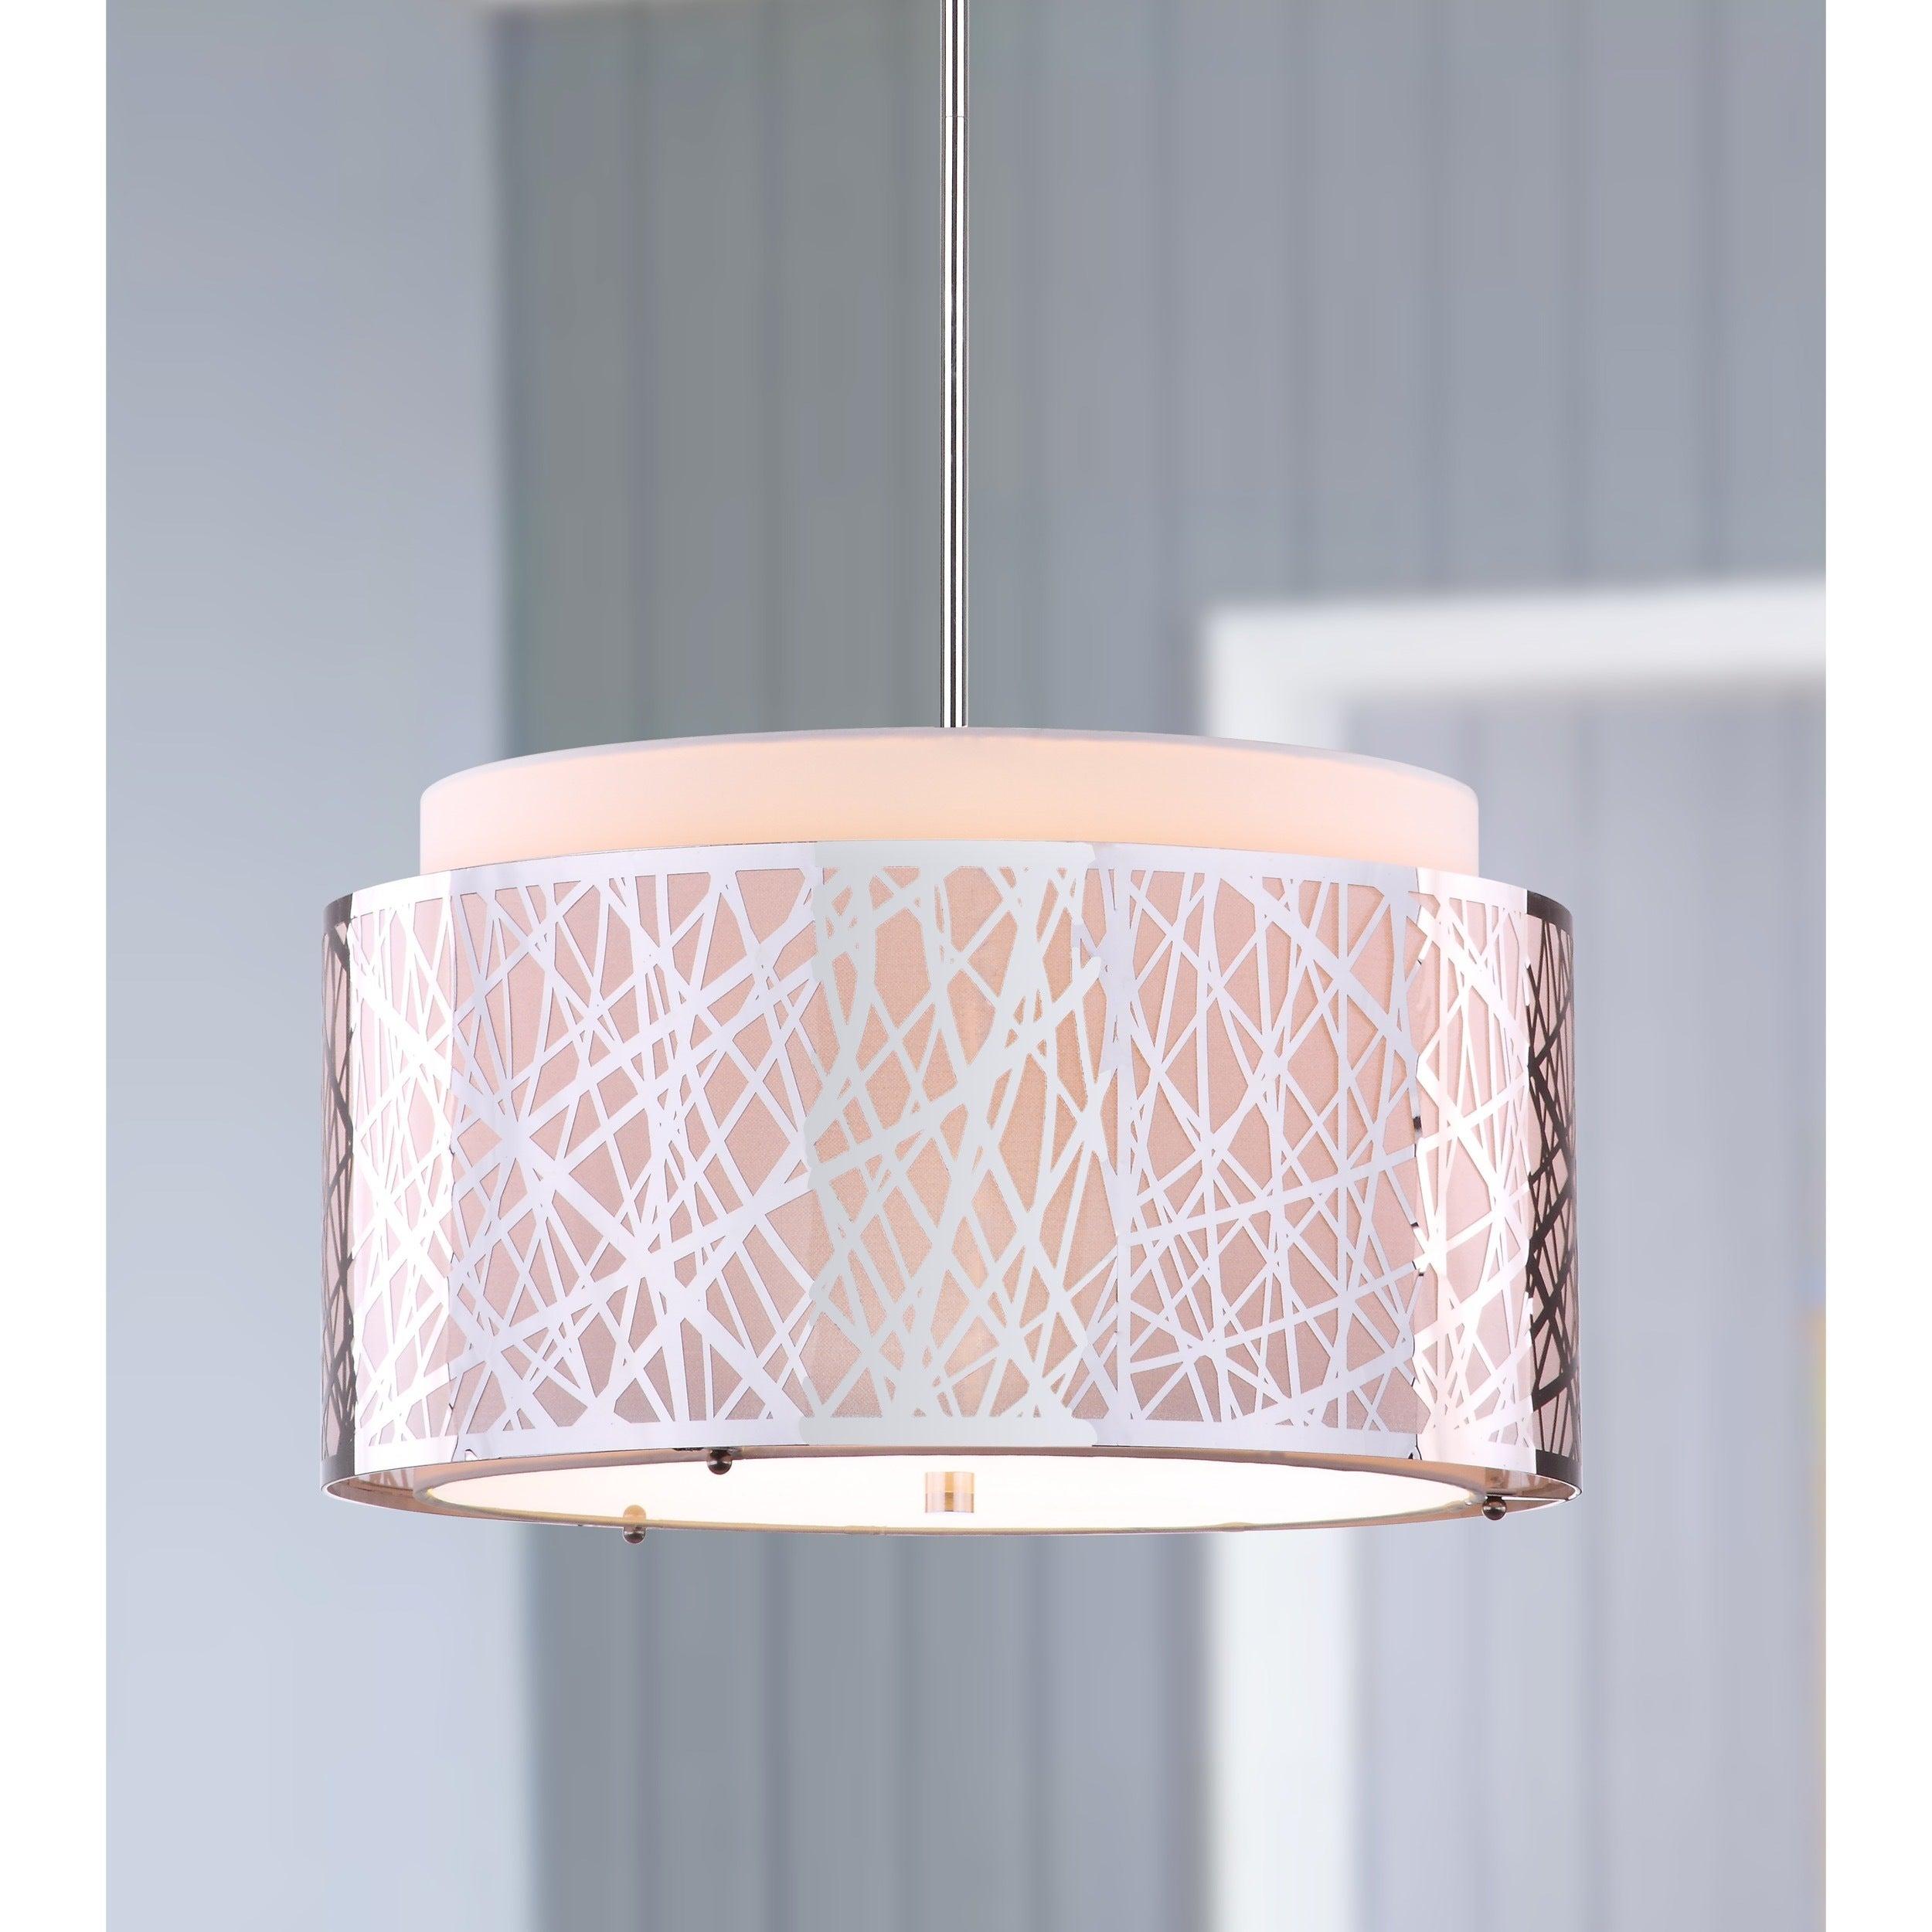 Shop Safavieh Lighting 20 Inch Adjustable 3 Light Double Tree Chrome  Pendant Lamp   Free Shipping Today   Overstock.com   9525135